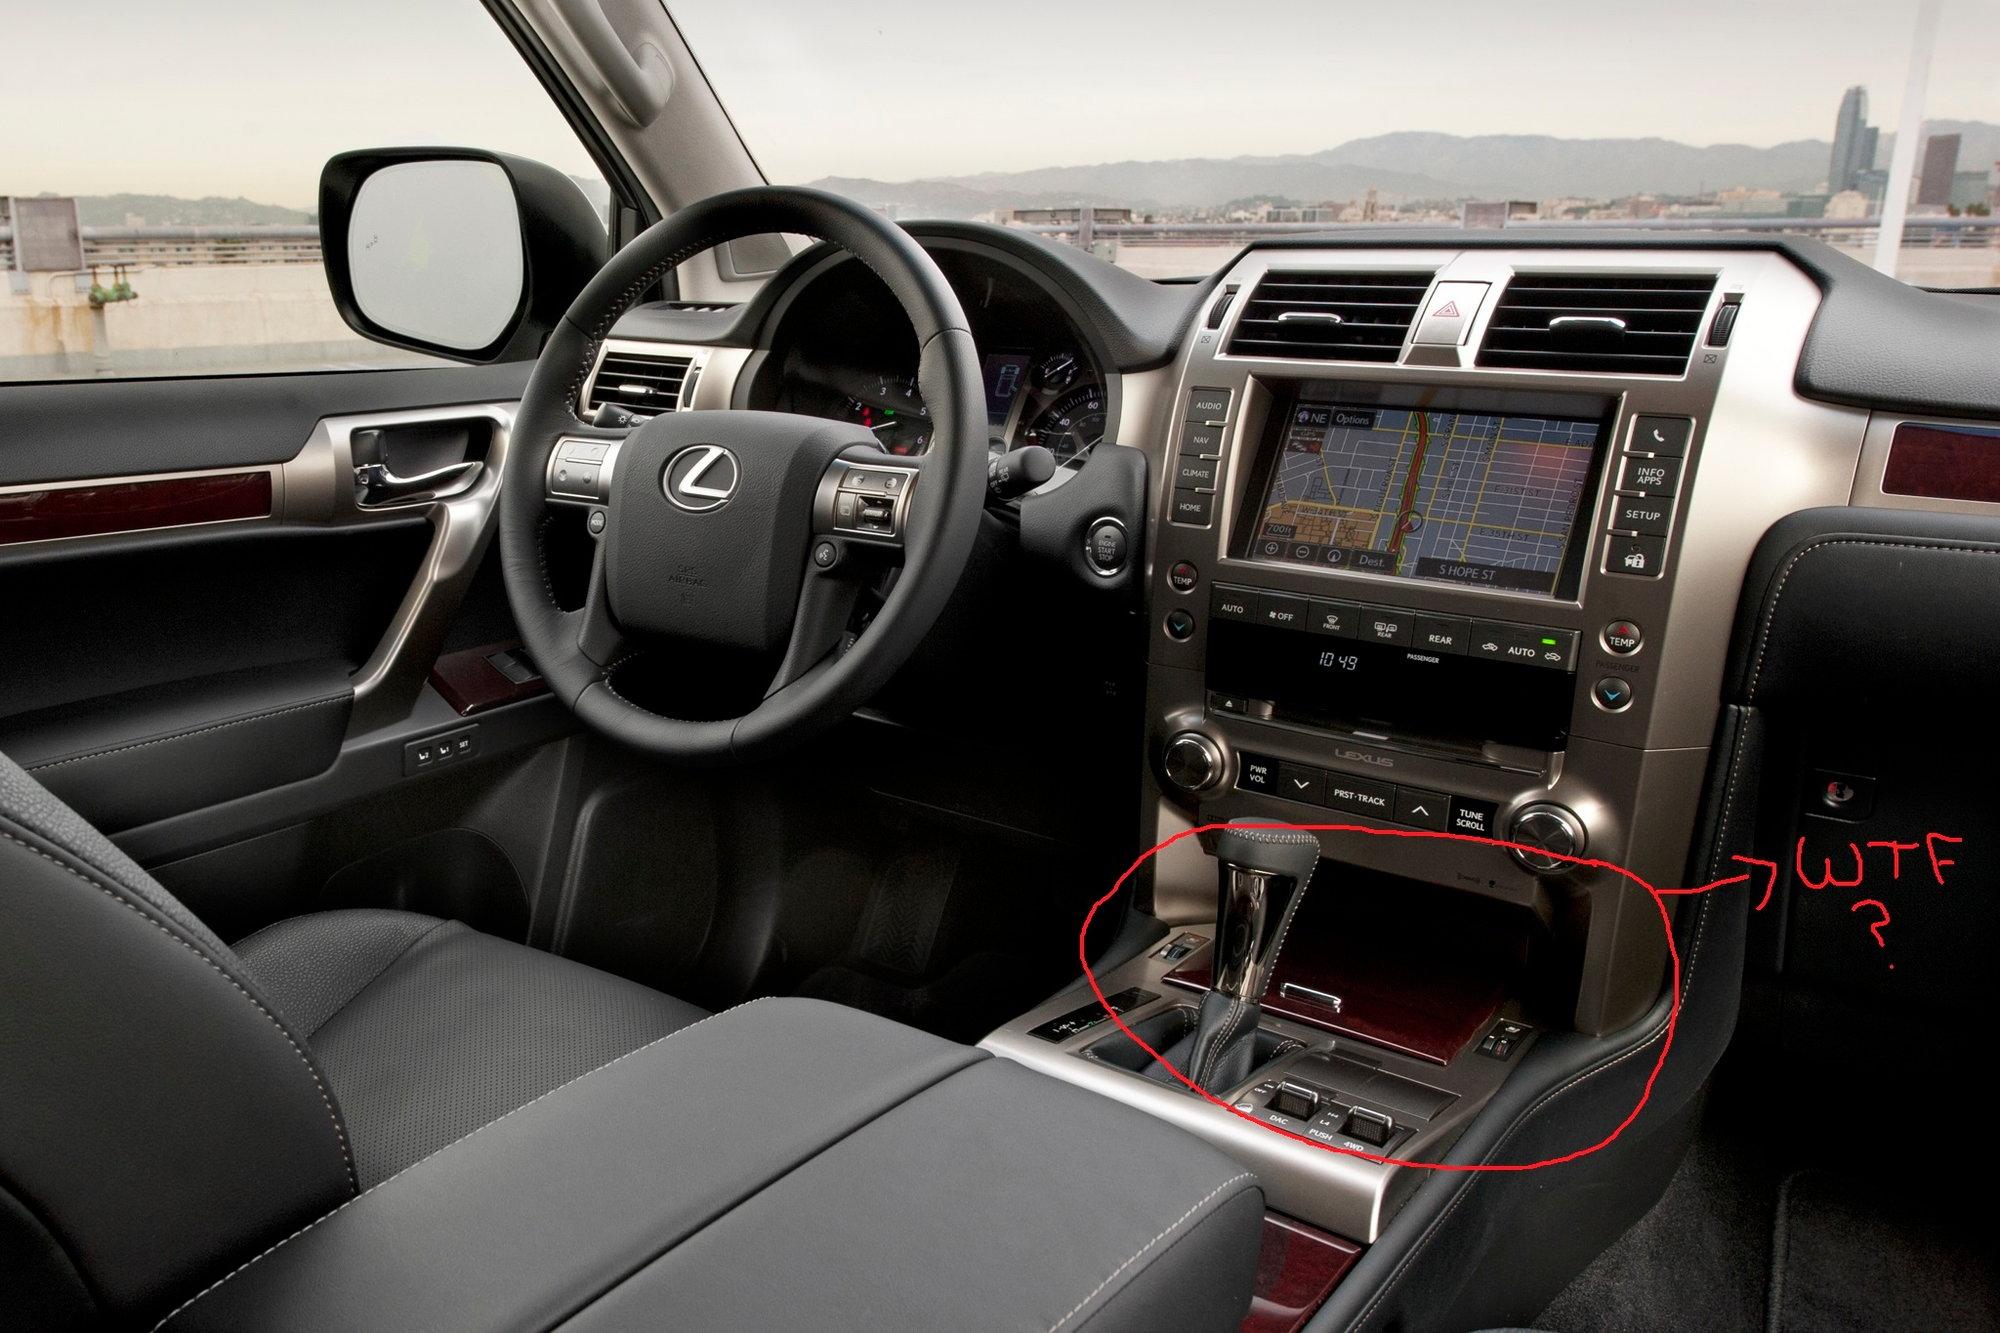 New Gx460 Interior Clublexus Lexus Forum Discussion